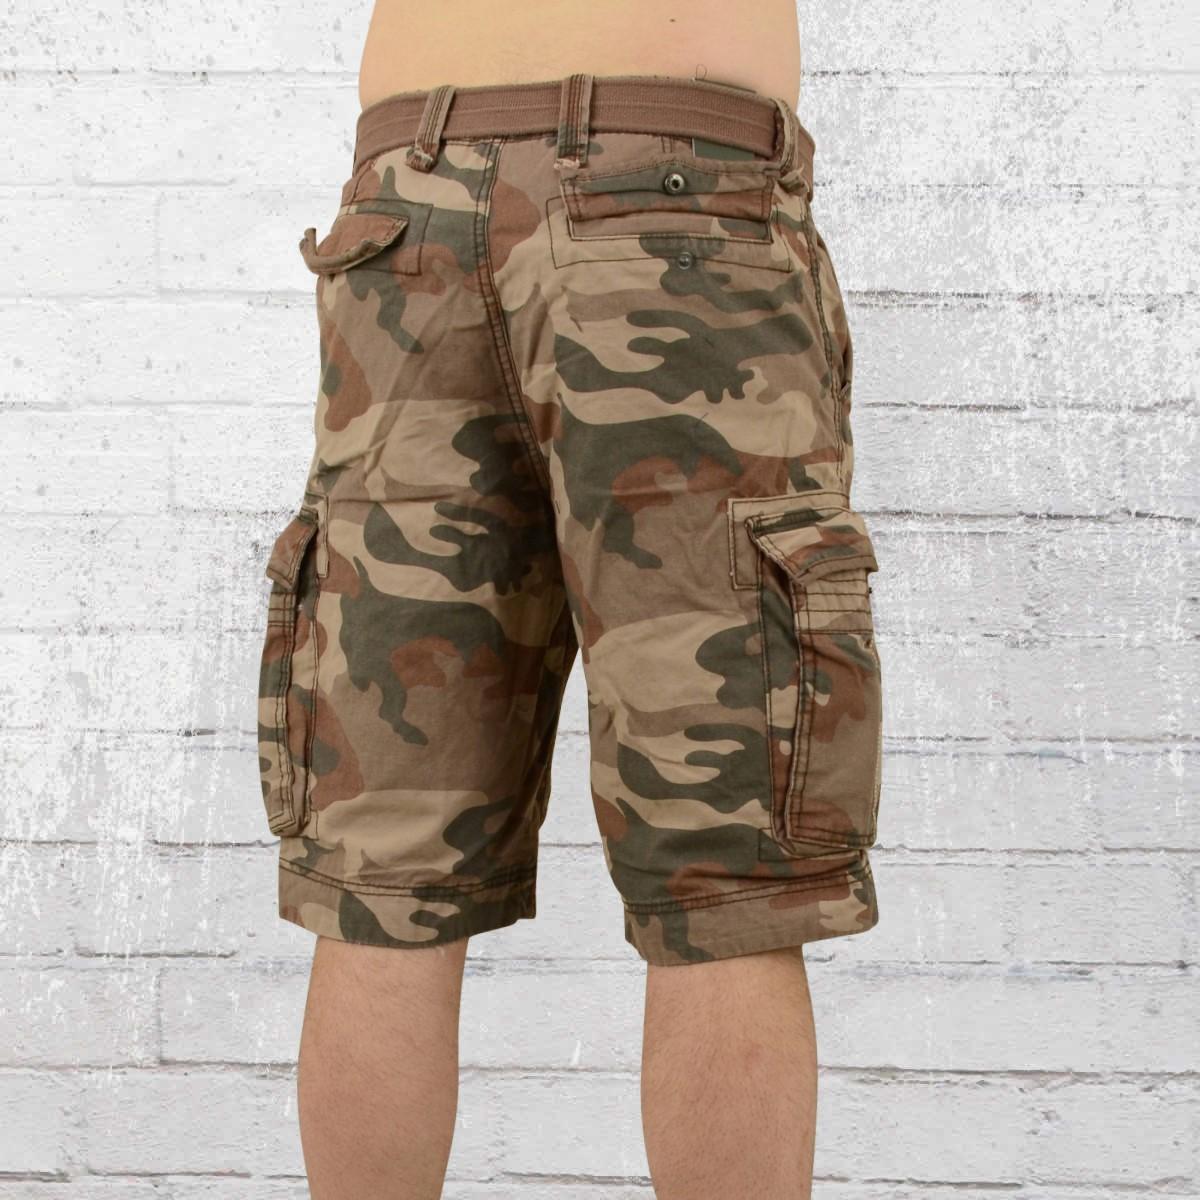 3fc73fb798 Have you seen? Jet Lag Mens Cargo Pocket Pants 007 camouflage